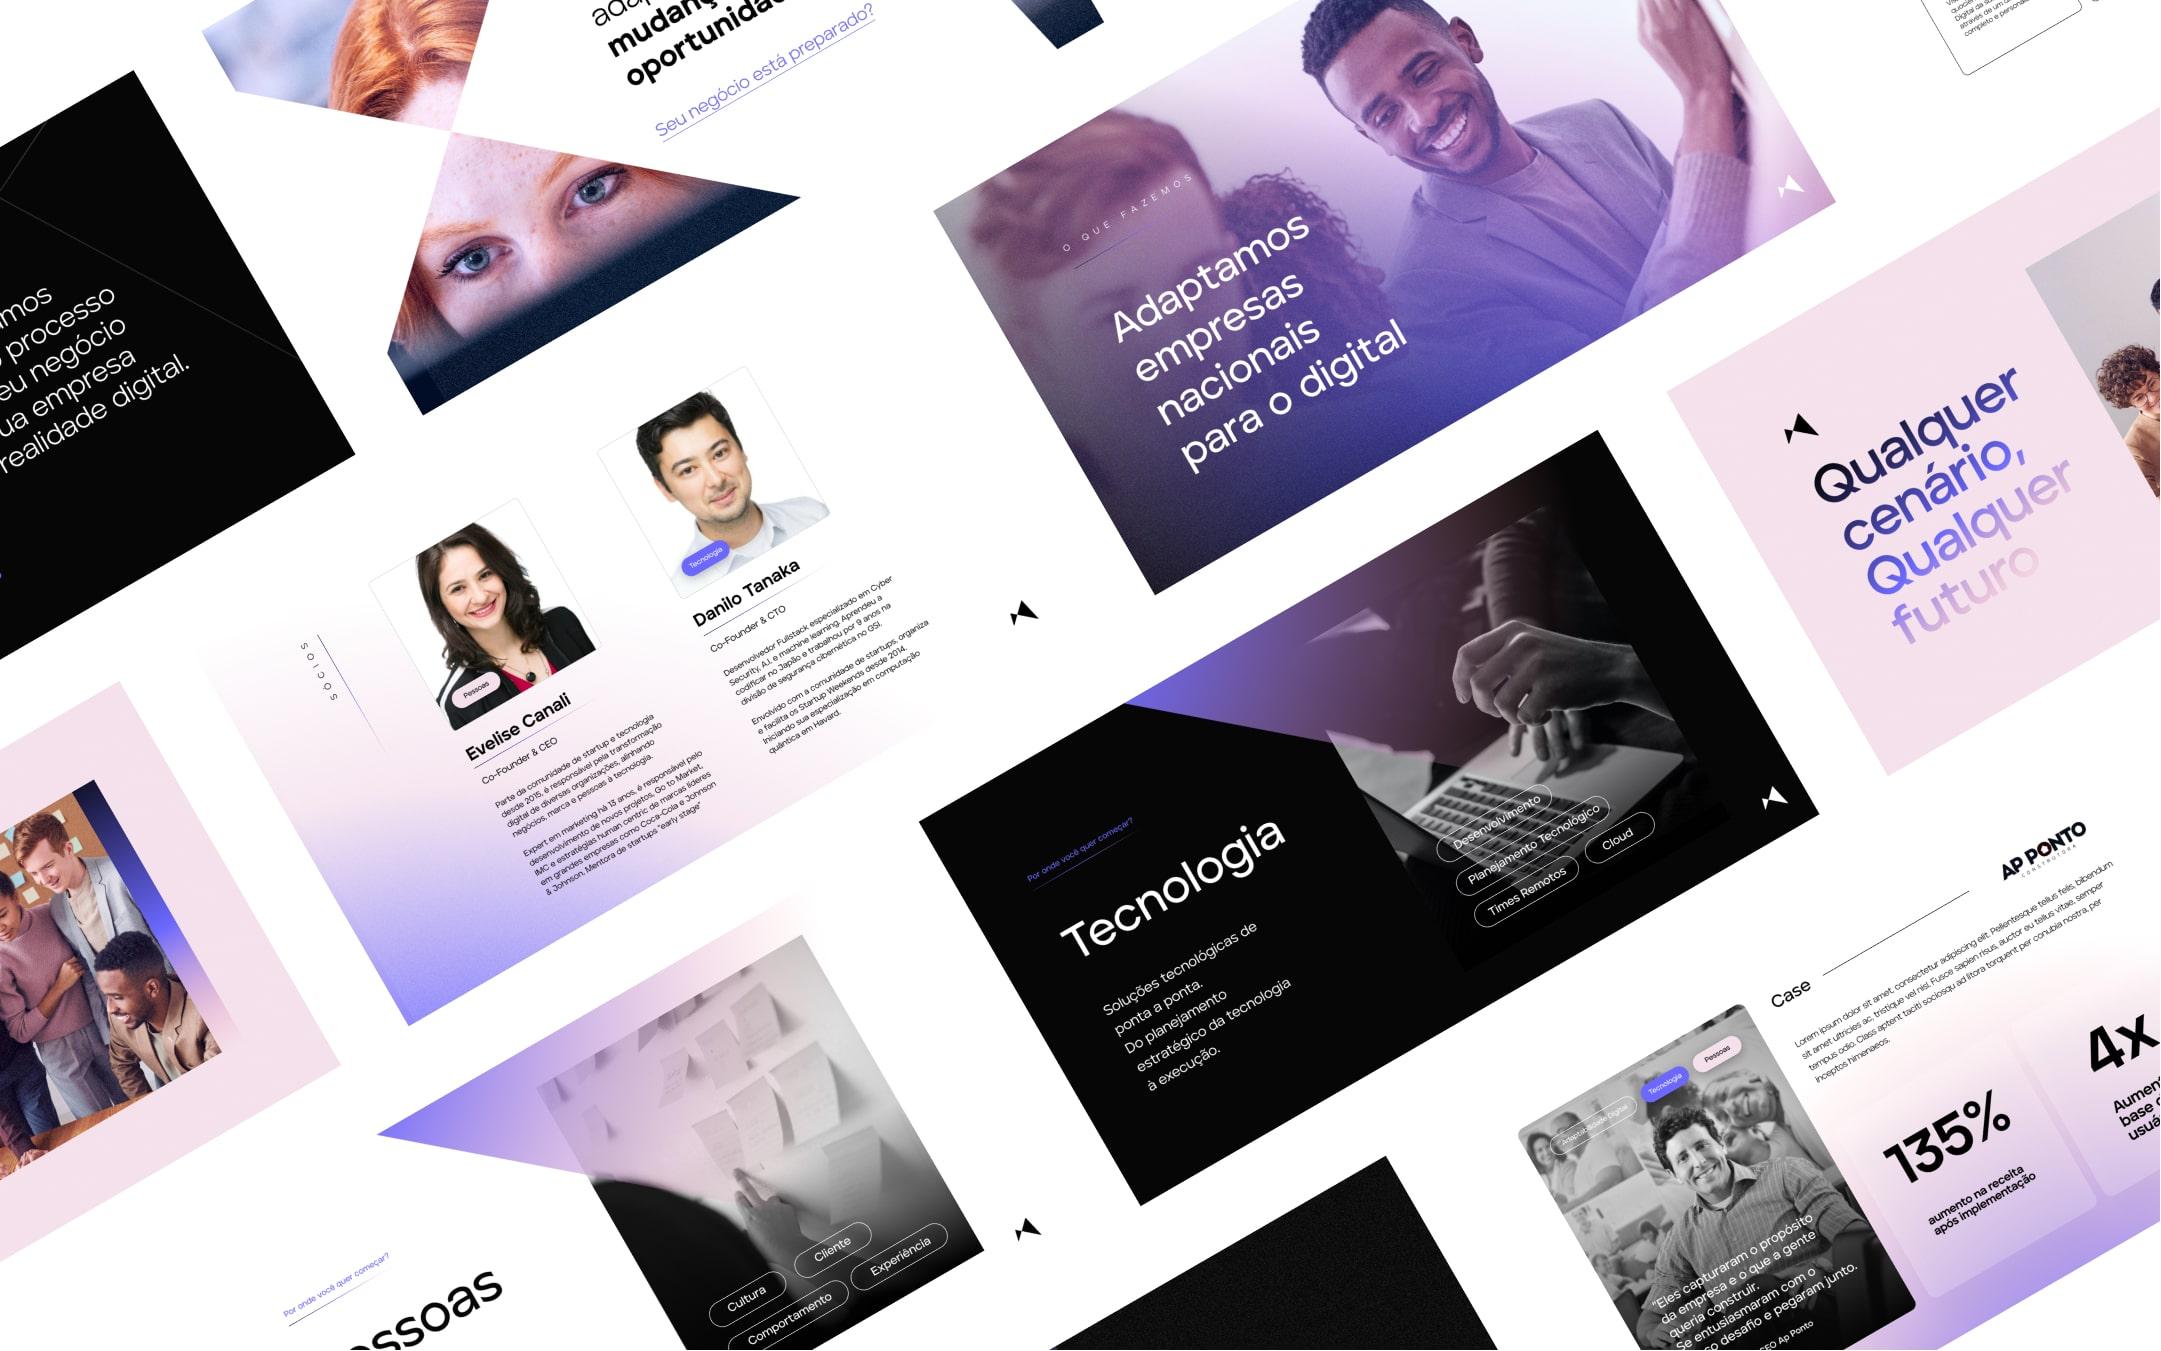 Mageda-Branding-brandupgrade-Design-Brand-Upgrade-Consulting-b2b2020-6-min